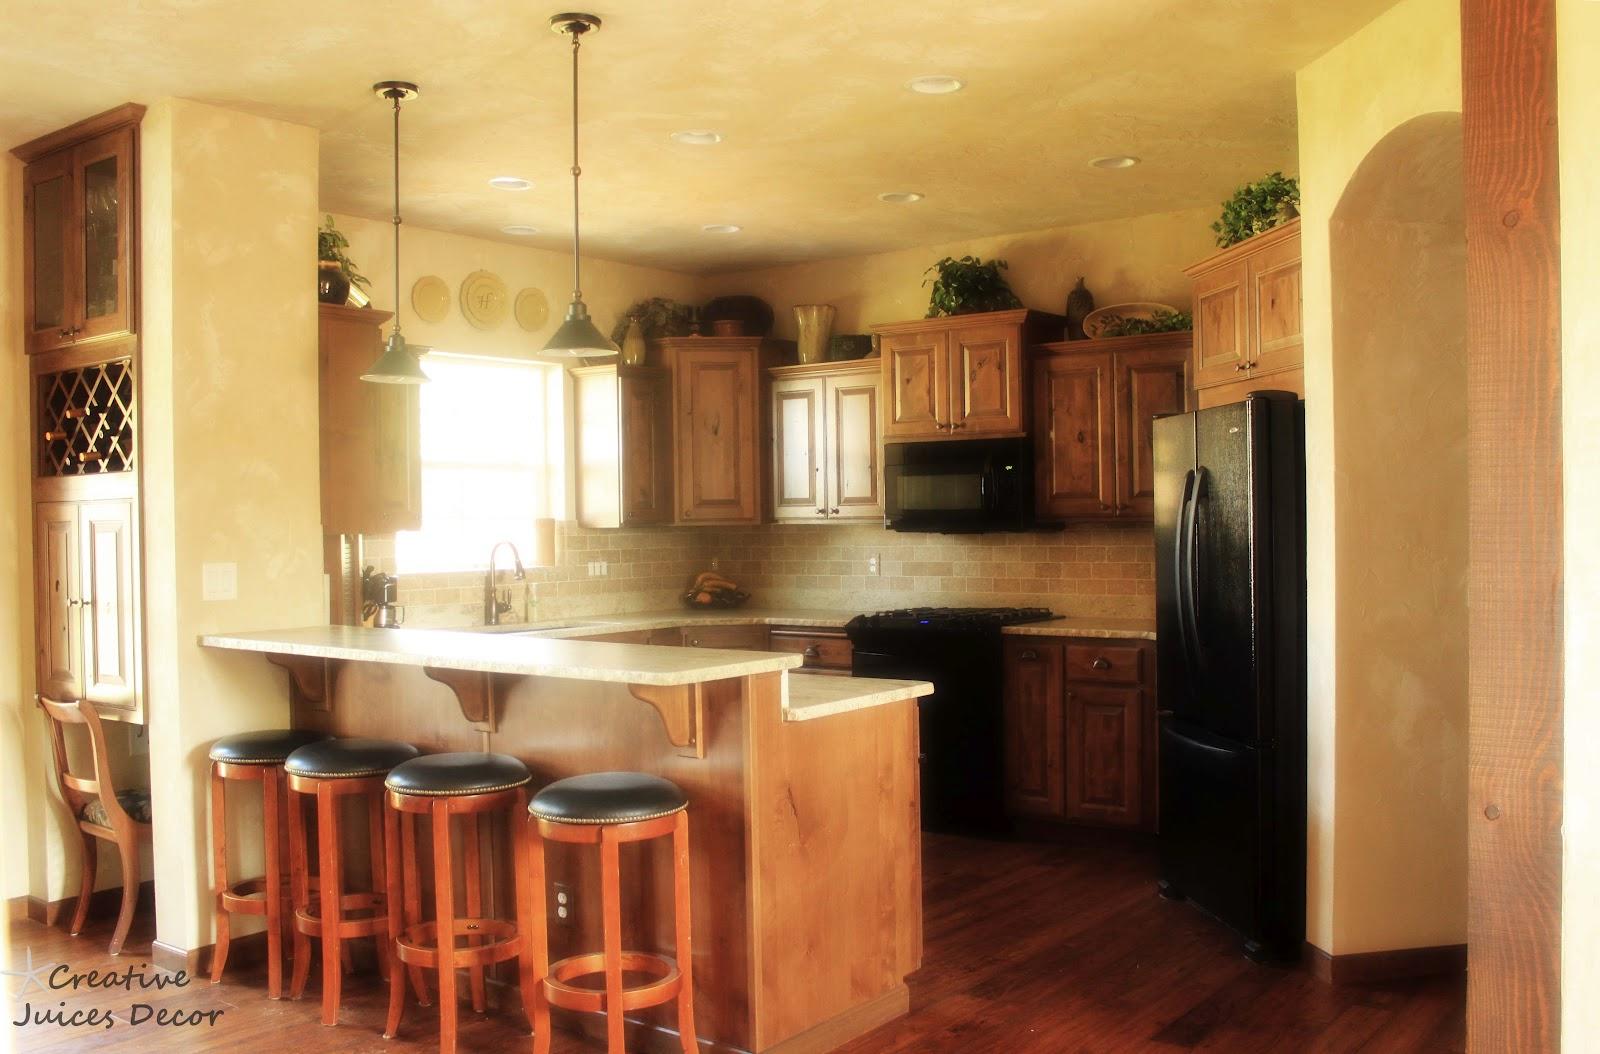 Kitchen Decor - Decor Above Cabinet Kitchen